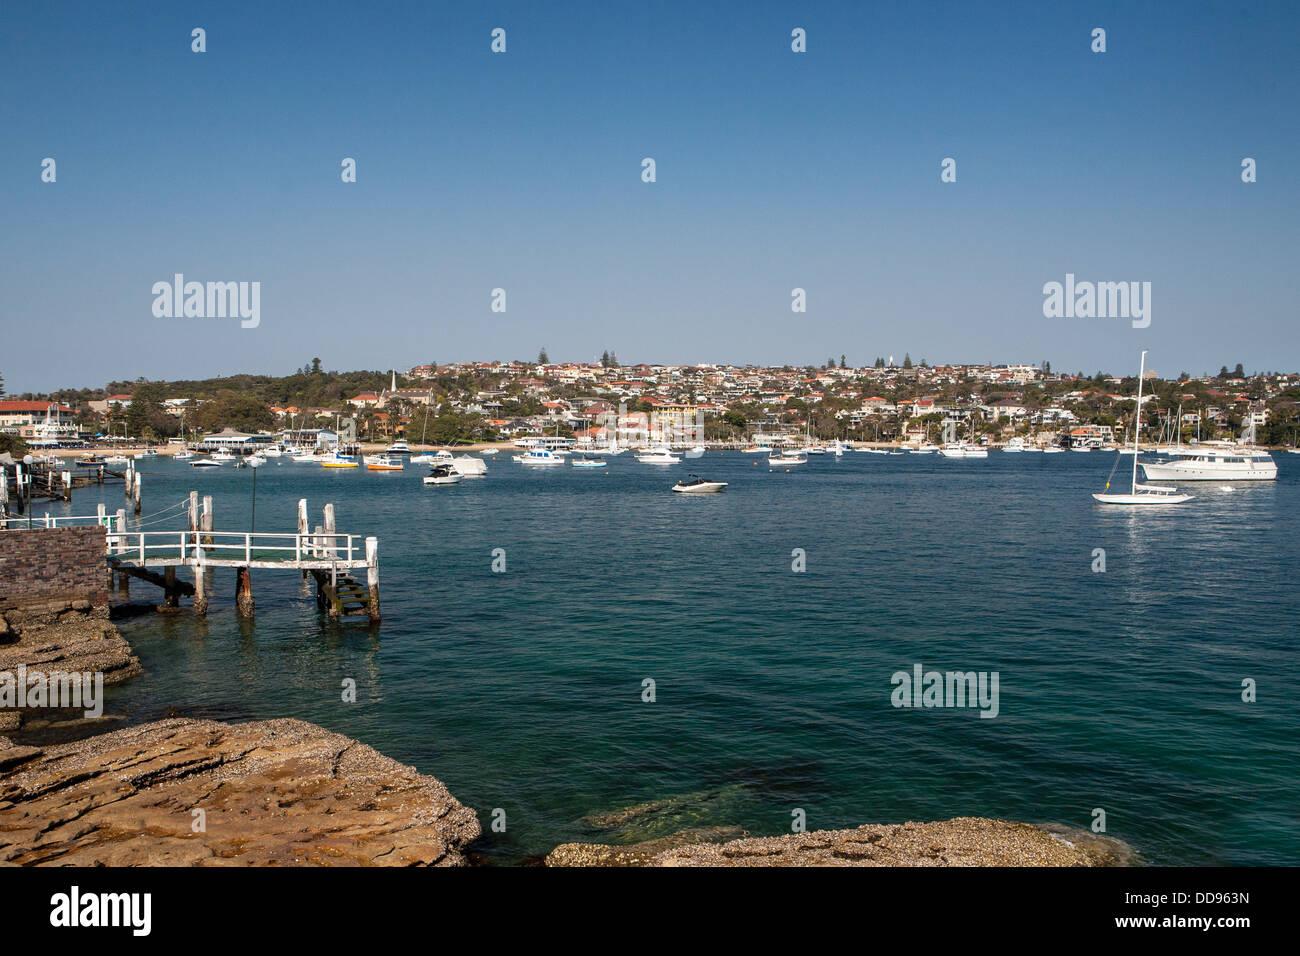 View across Watsons Bay in Sydney, Australia - Stock Image